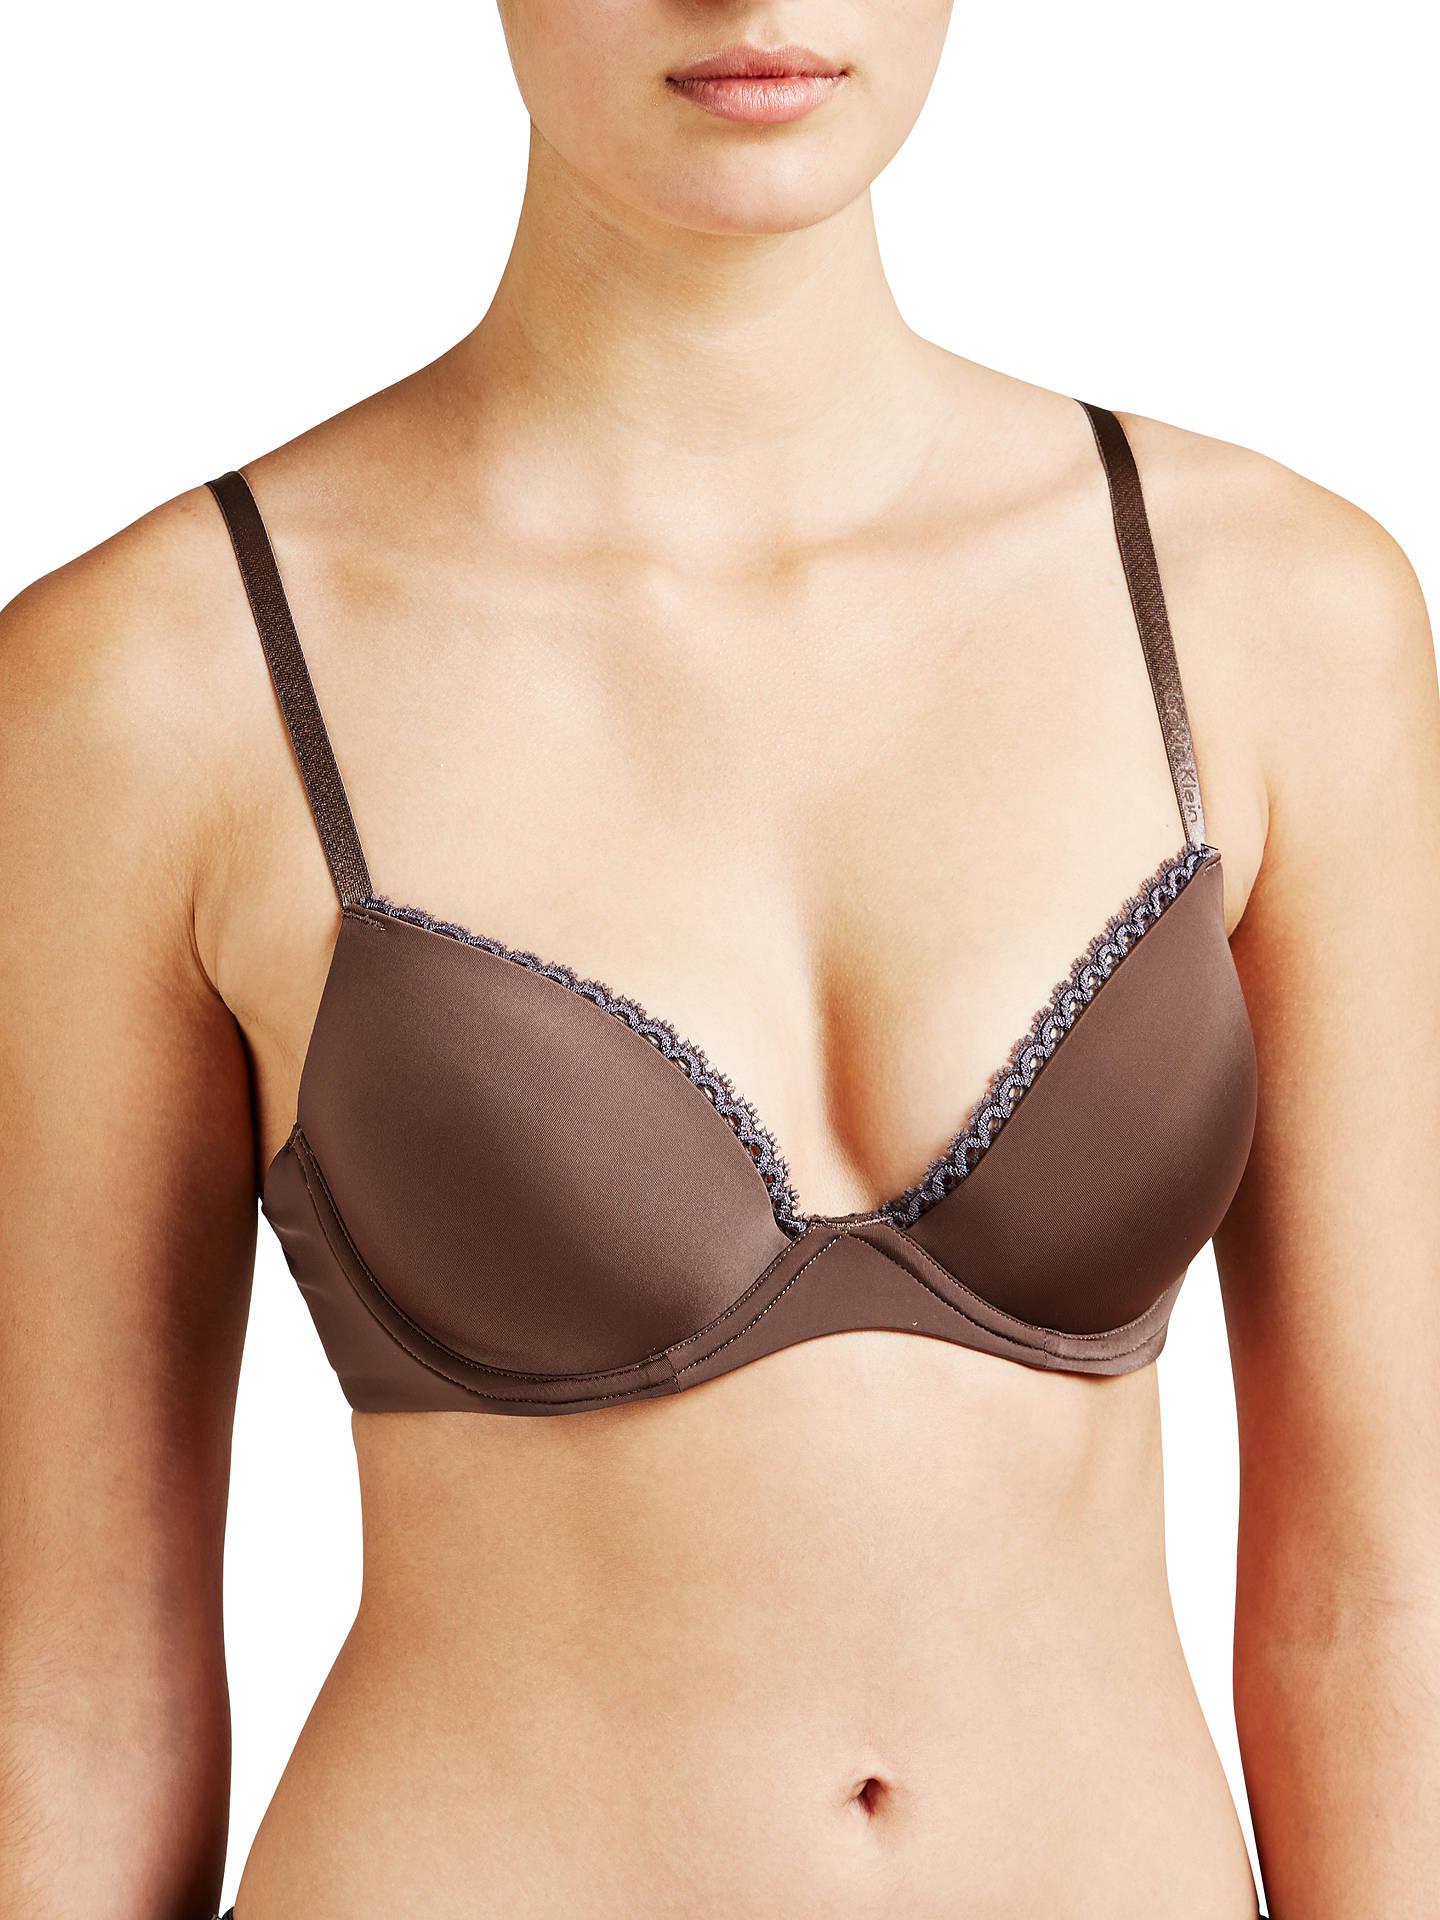 c1bc86a86ae59 BuyCalvin Klein Underwear Seductive Comfort Customised Lift Bra